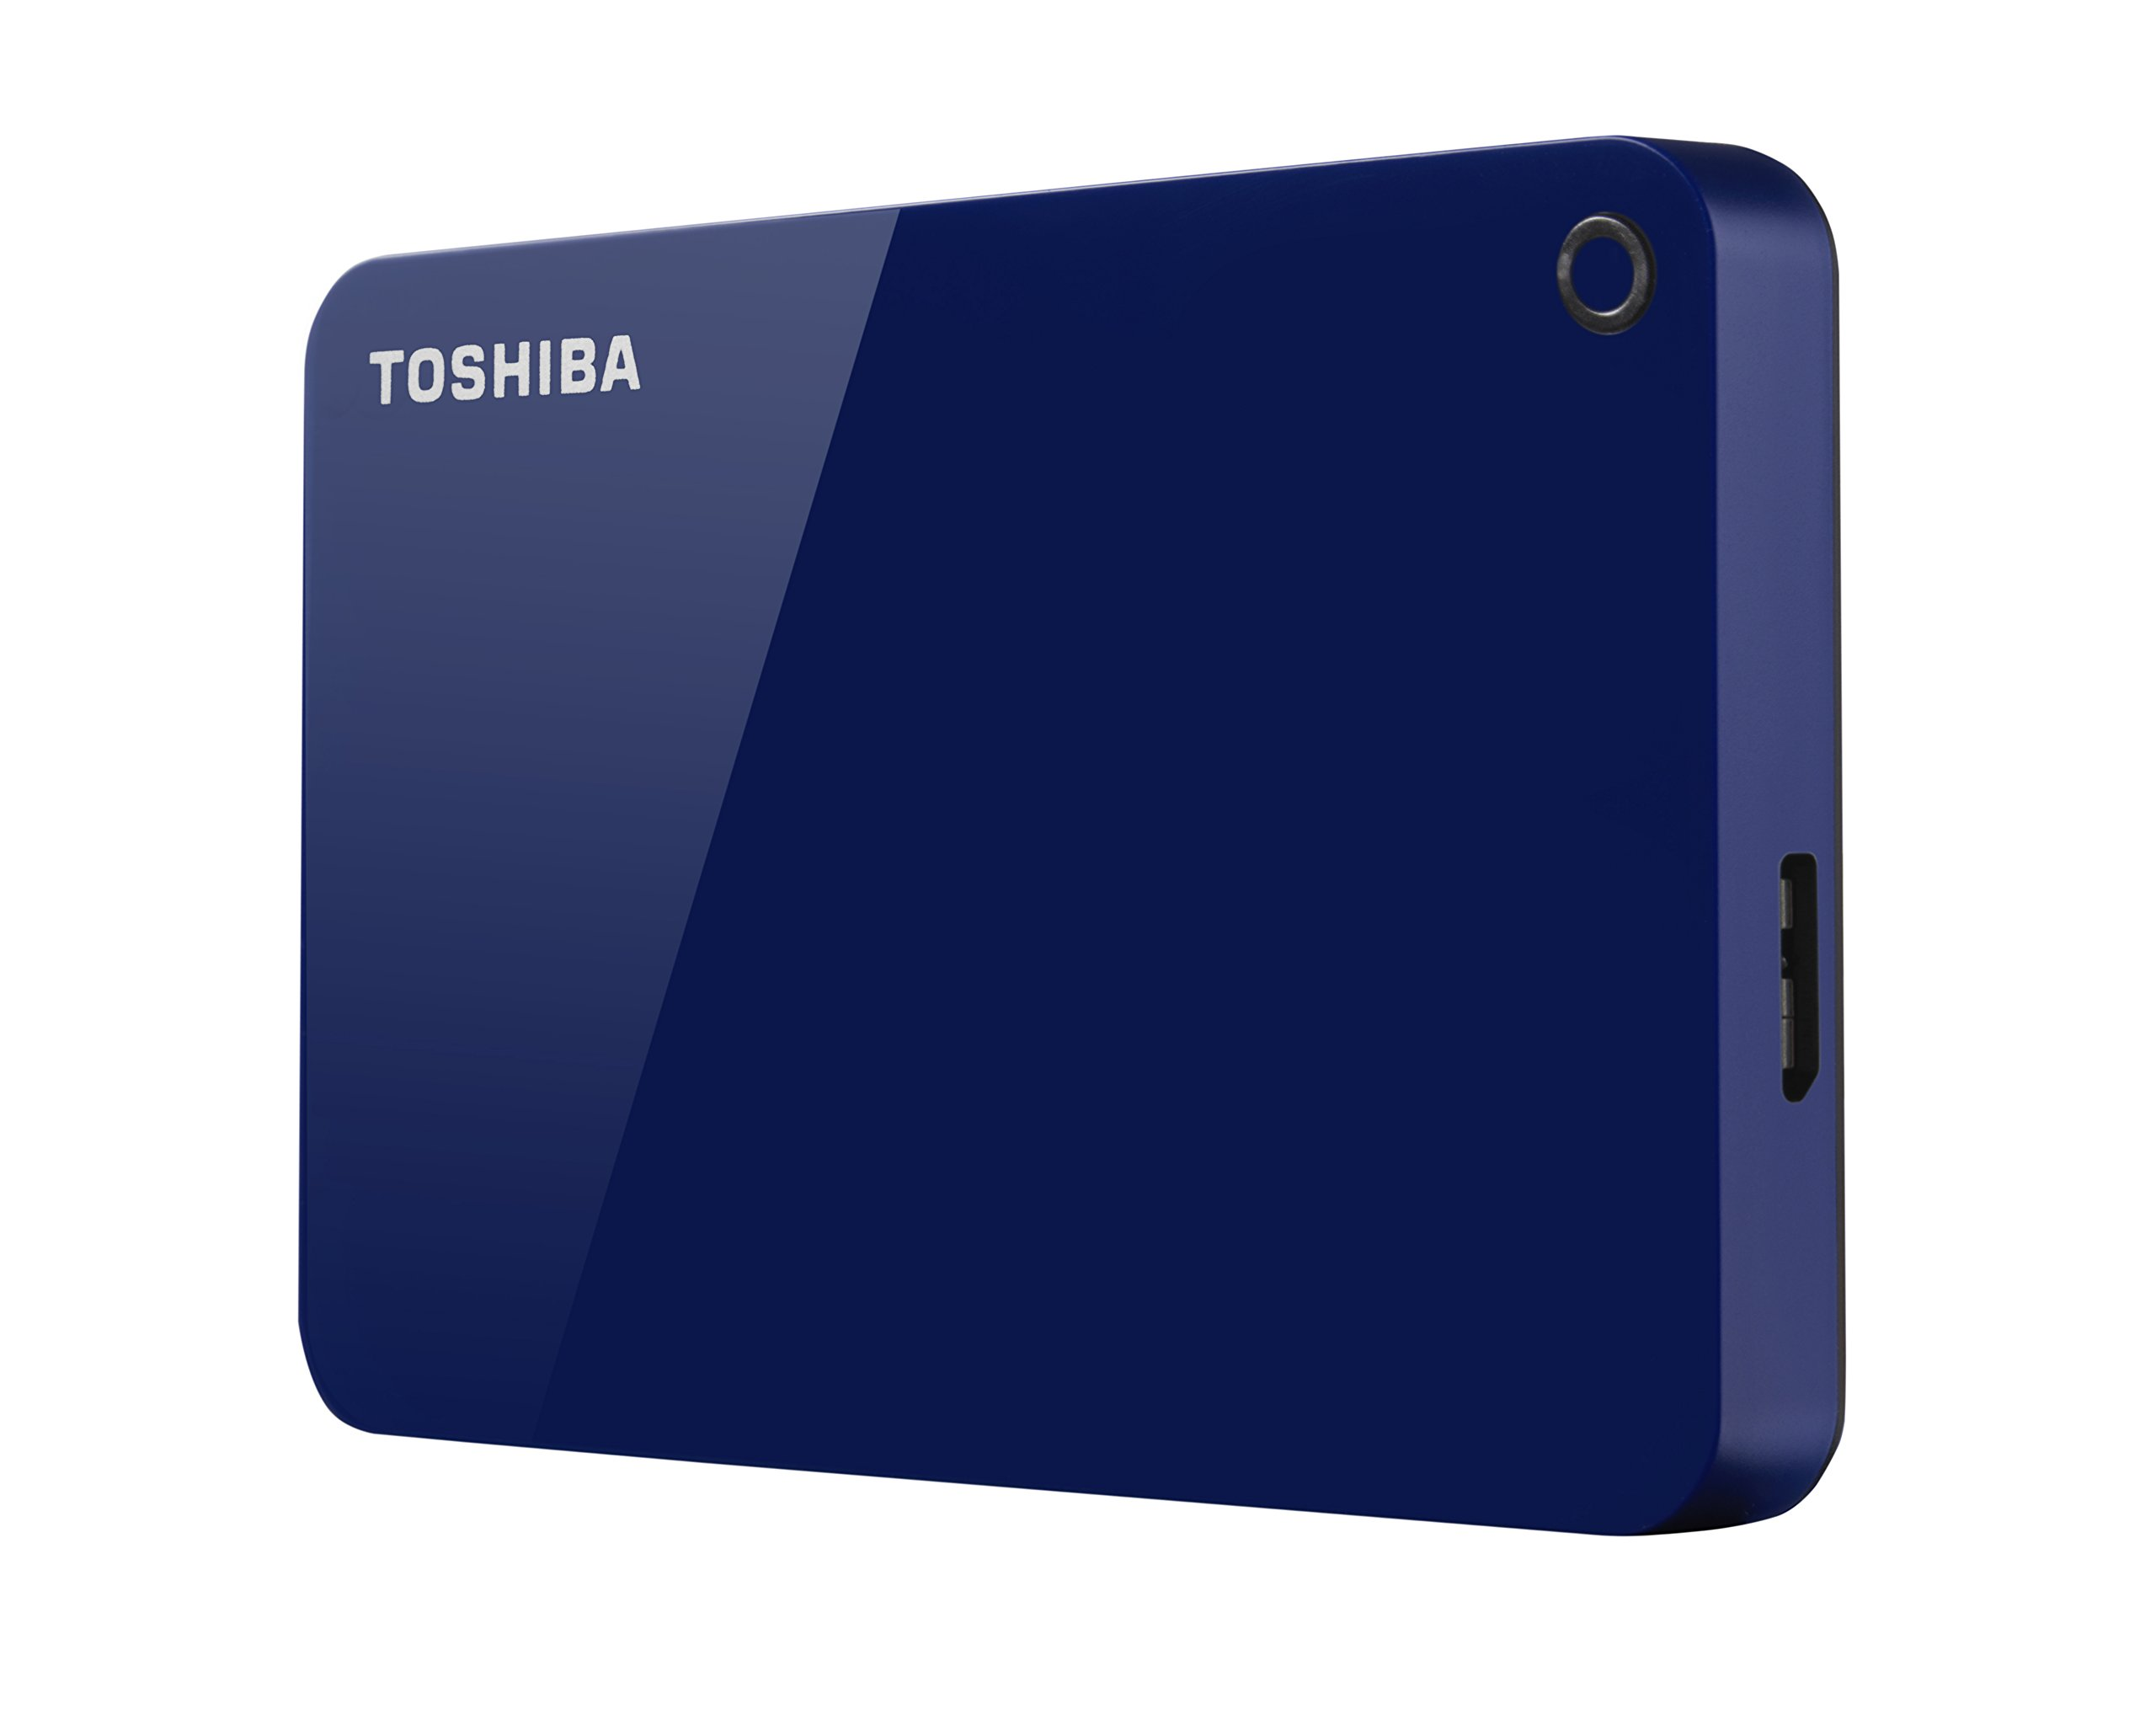 Toshiba Canvio Advance 1TB Portable External Hard Drive USB 3.0, Blue (HDTC910XL3AA) by Toshiba (Image #3)